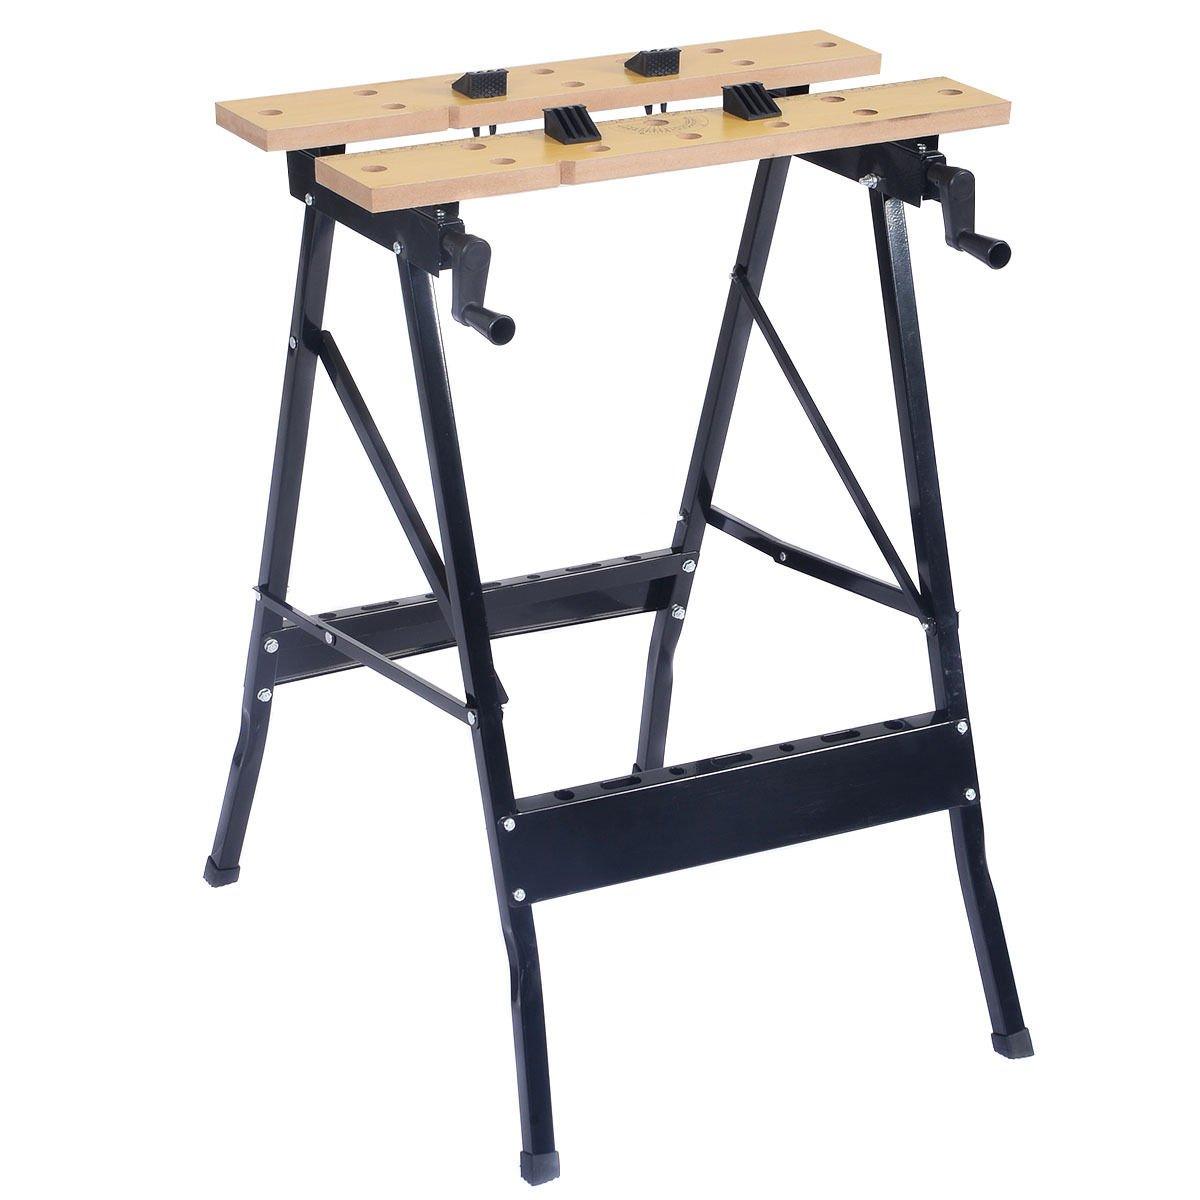 Steel Frame Swivel Folding Work Bench Resist Warping Table